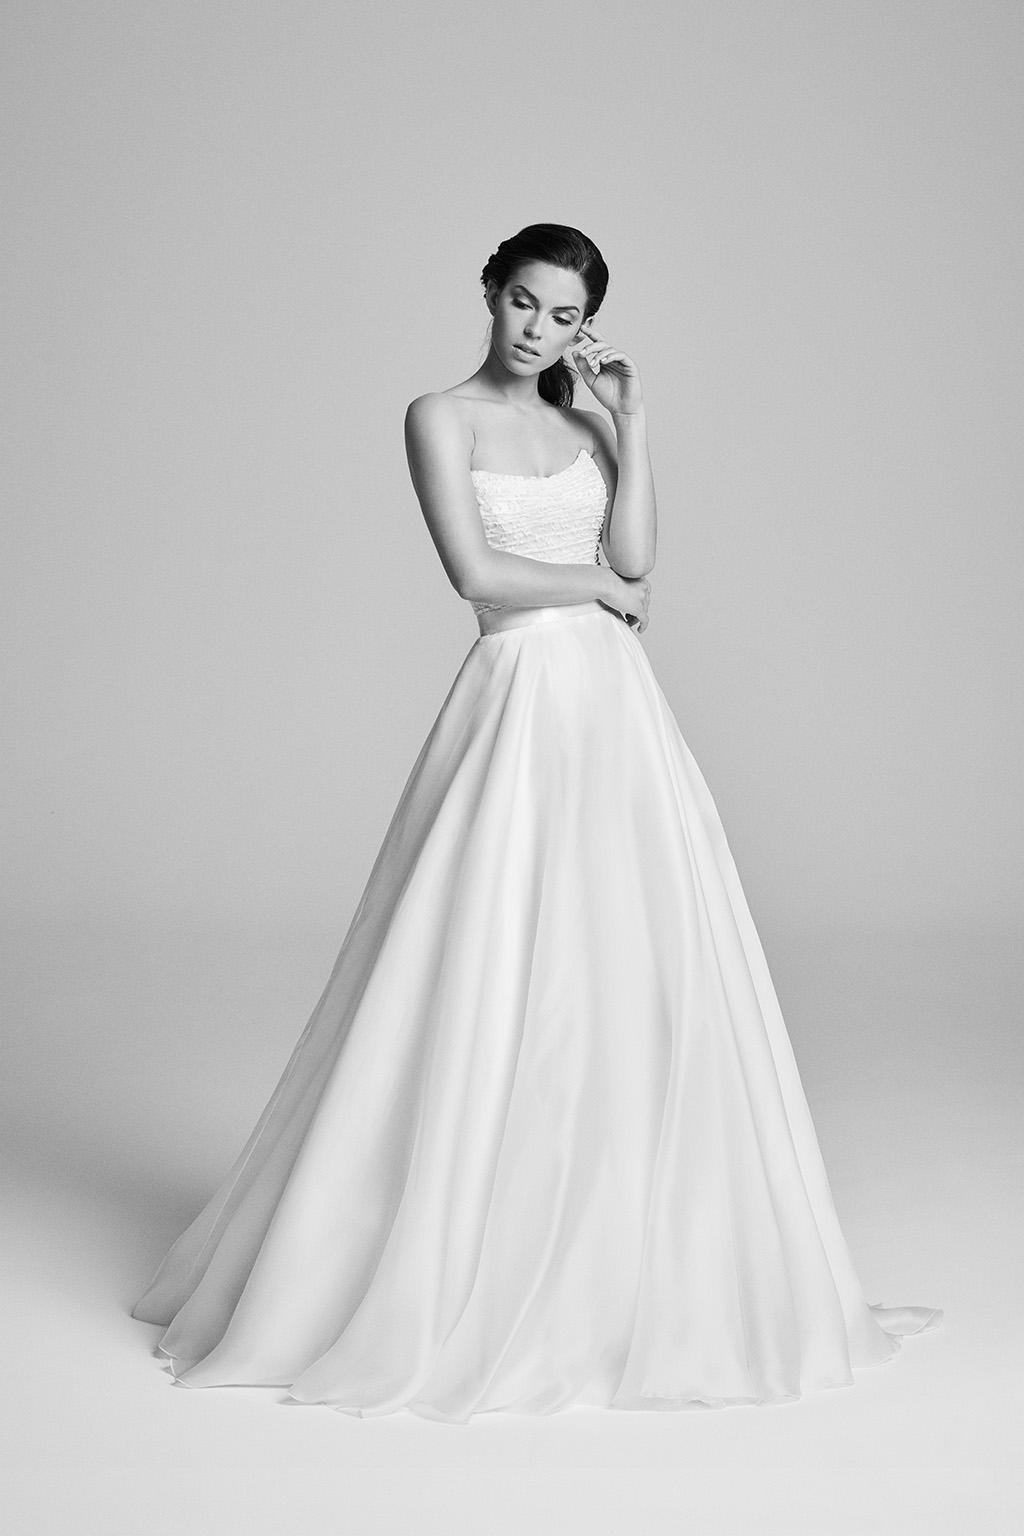 hemmingway-bridalcouture-wedding-dresses-uk-belle-epoque-collection-2018-by-designer-suzanne-neville